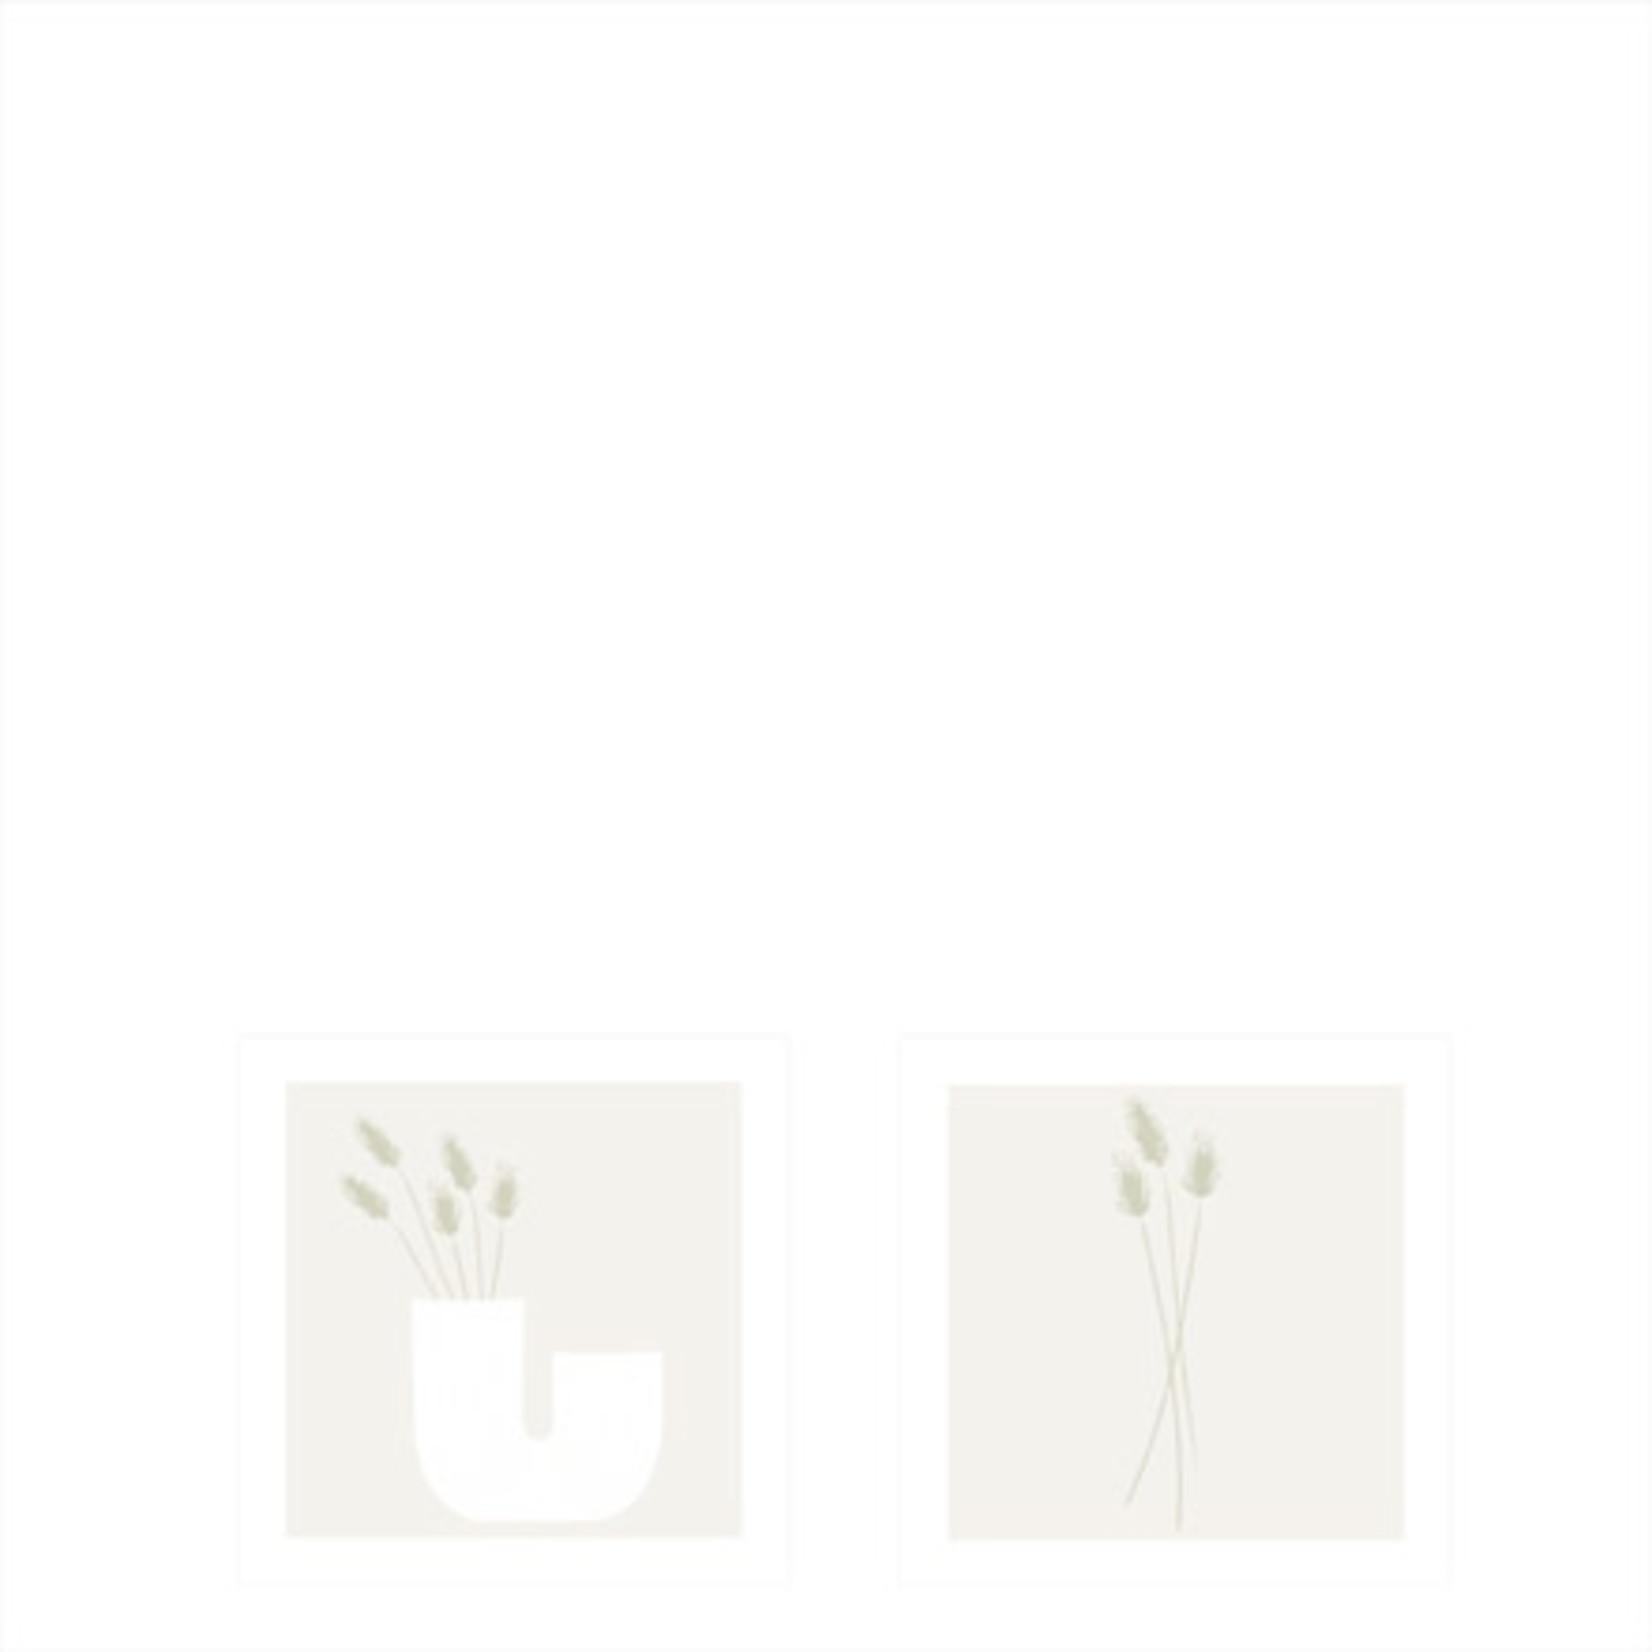 Storefactory  Matchbox Stravalla